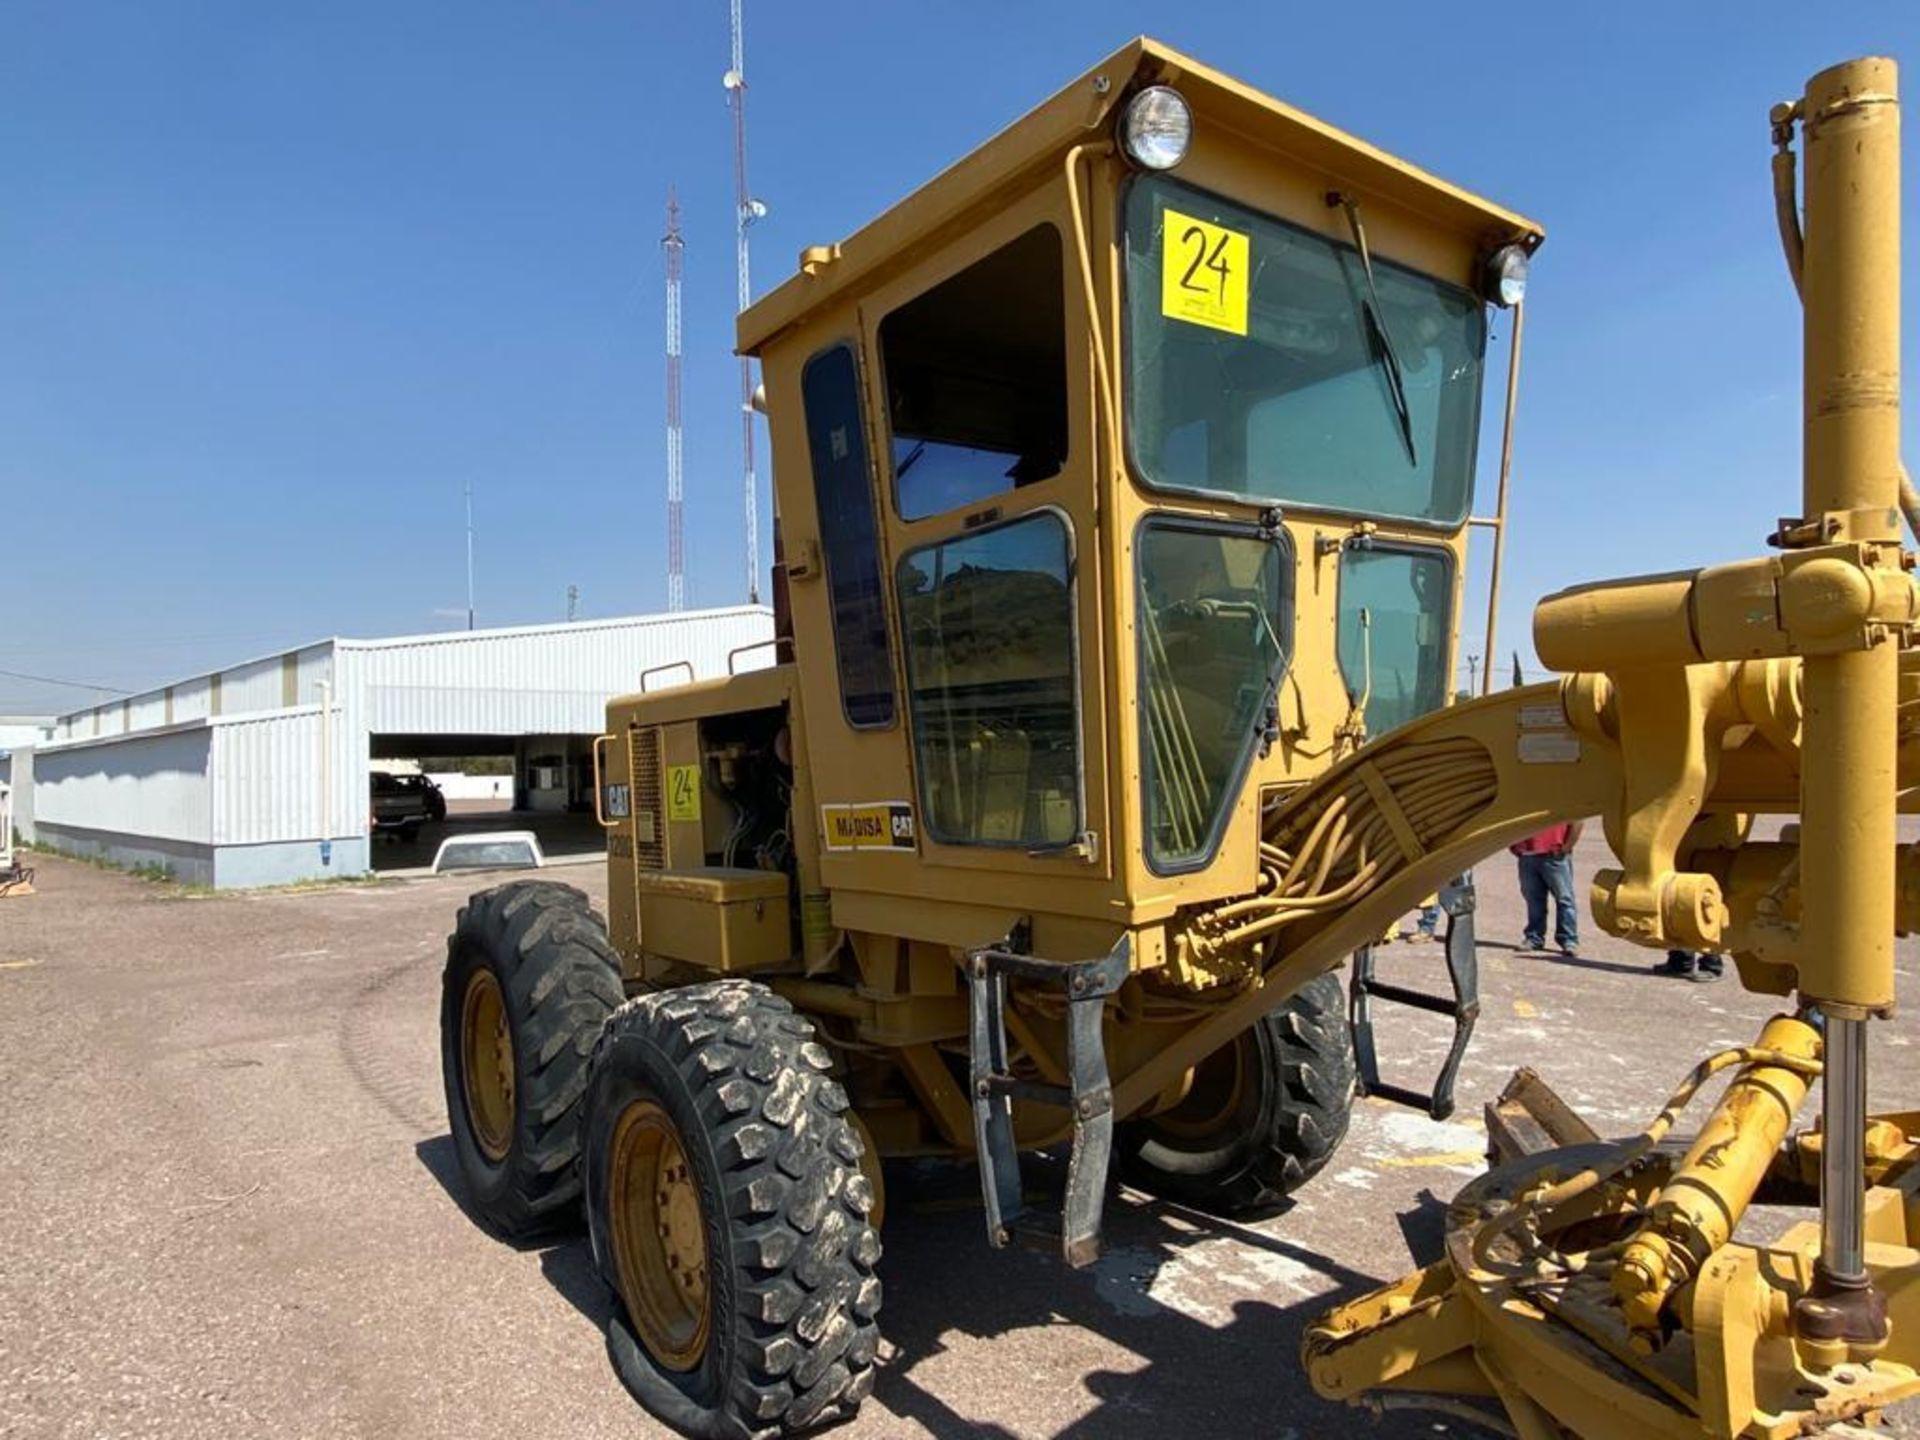 Caterpillar 120G Motor Grader, Serial number 87V09646, Motor number PQ883-2/07Z28983 - Image 21 of 61